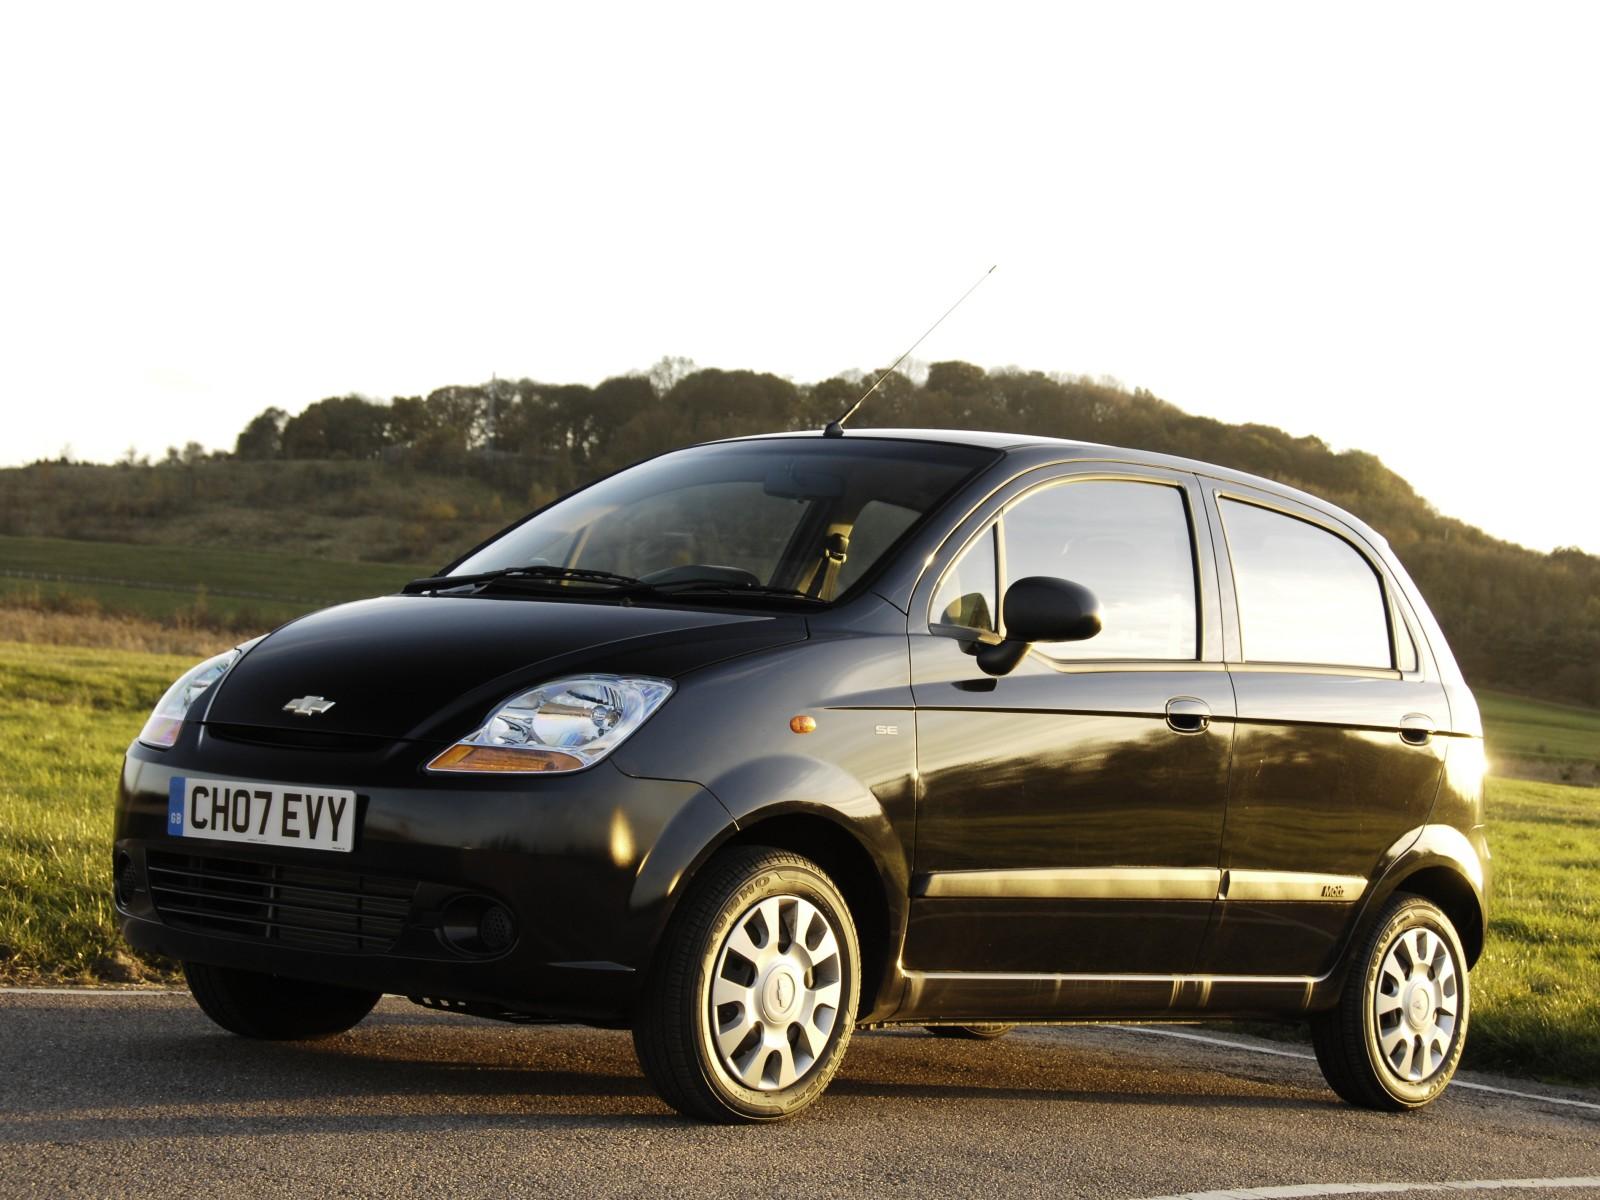 2009 Chevrolet Matiz Wallpapers Pictures Specifications